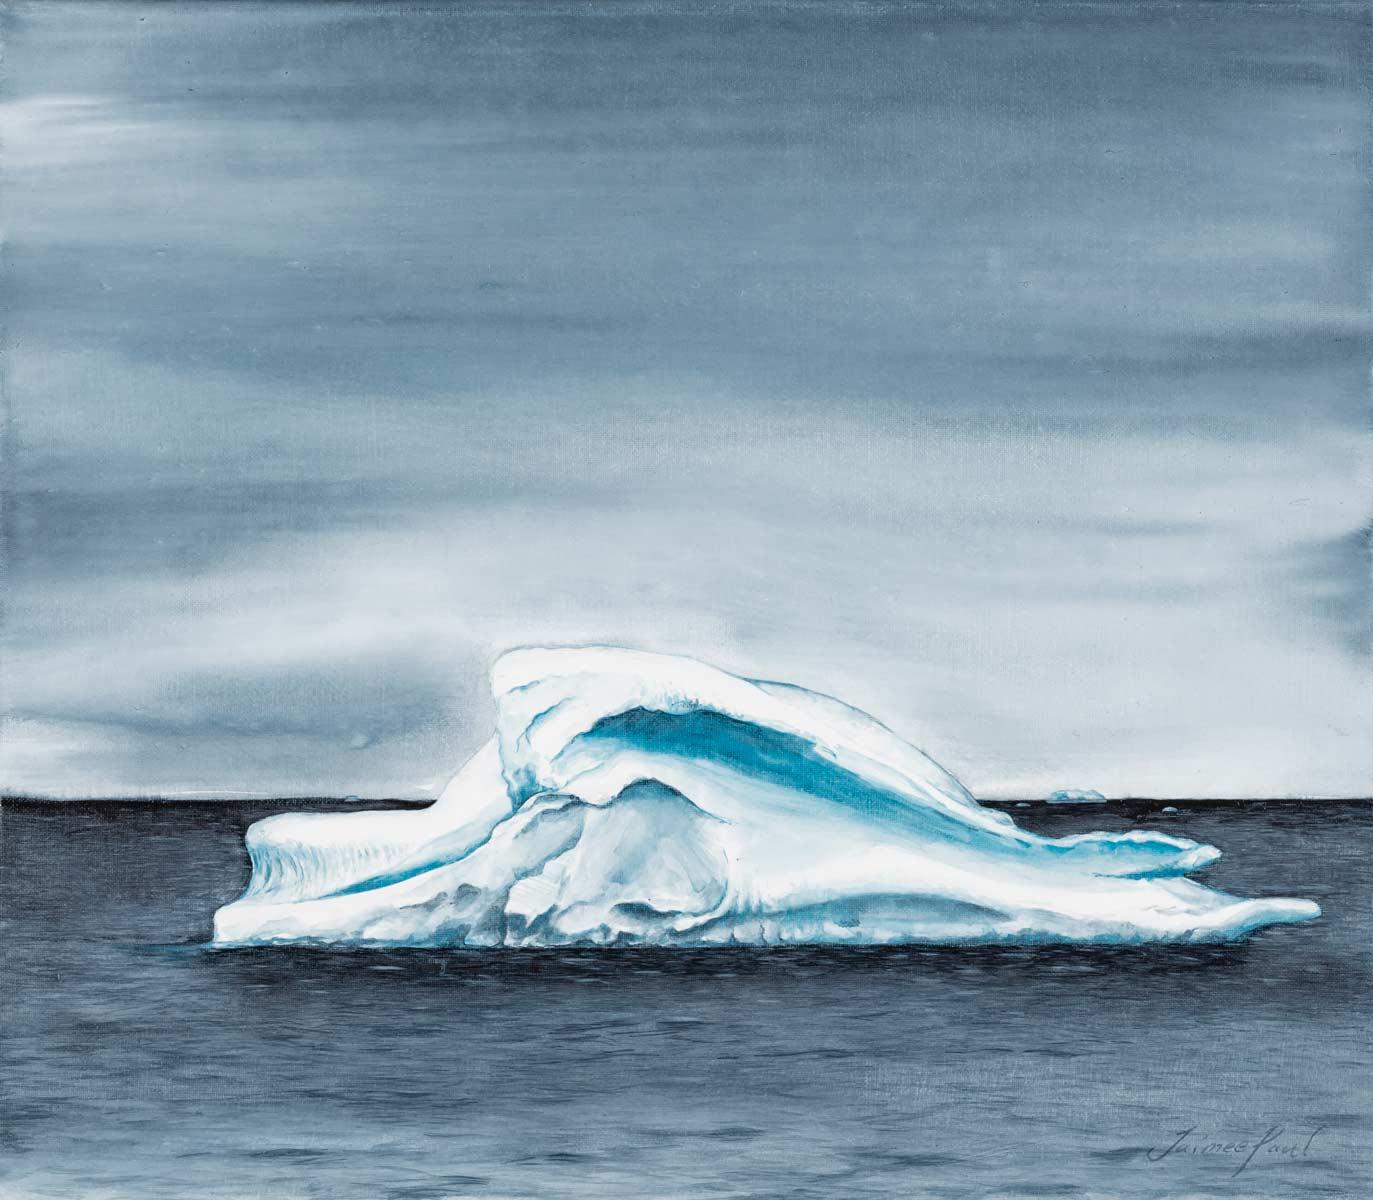 Jaimee-Paul_Darkest-Before-Dawn_43.5x38.5_Watercolour-on-canvas_780_LowRes.jpg